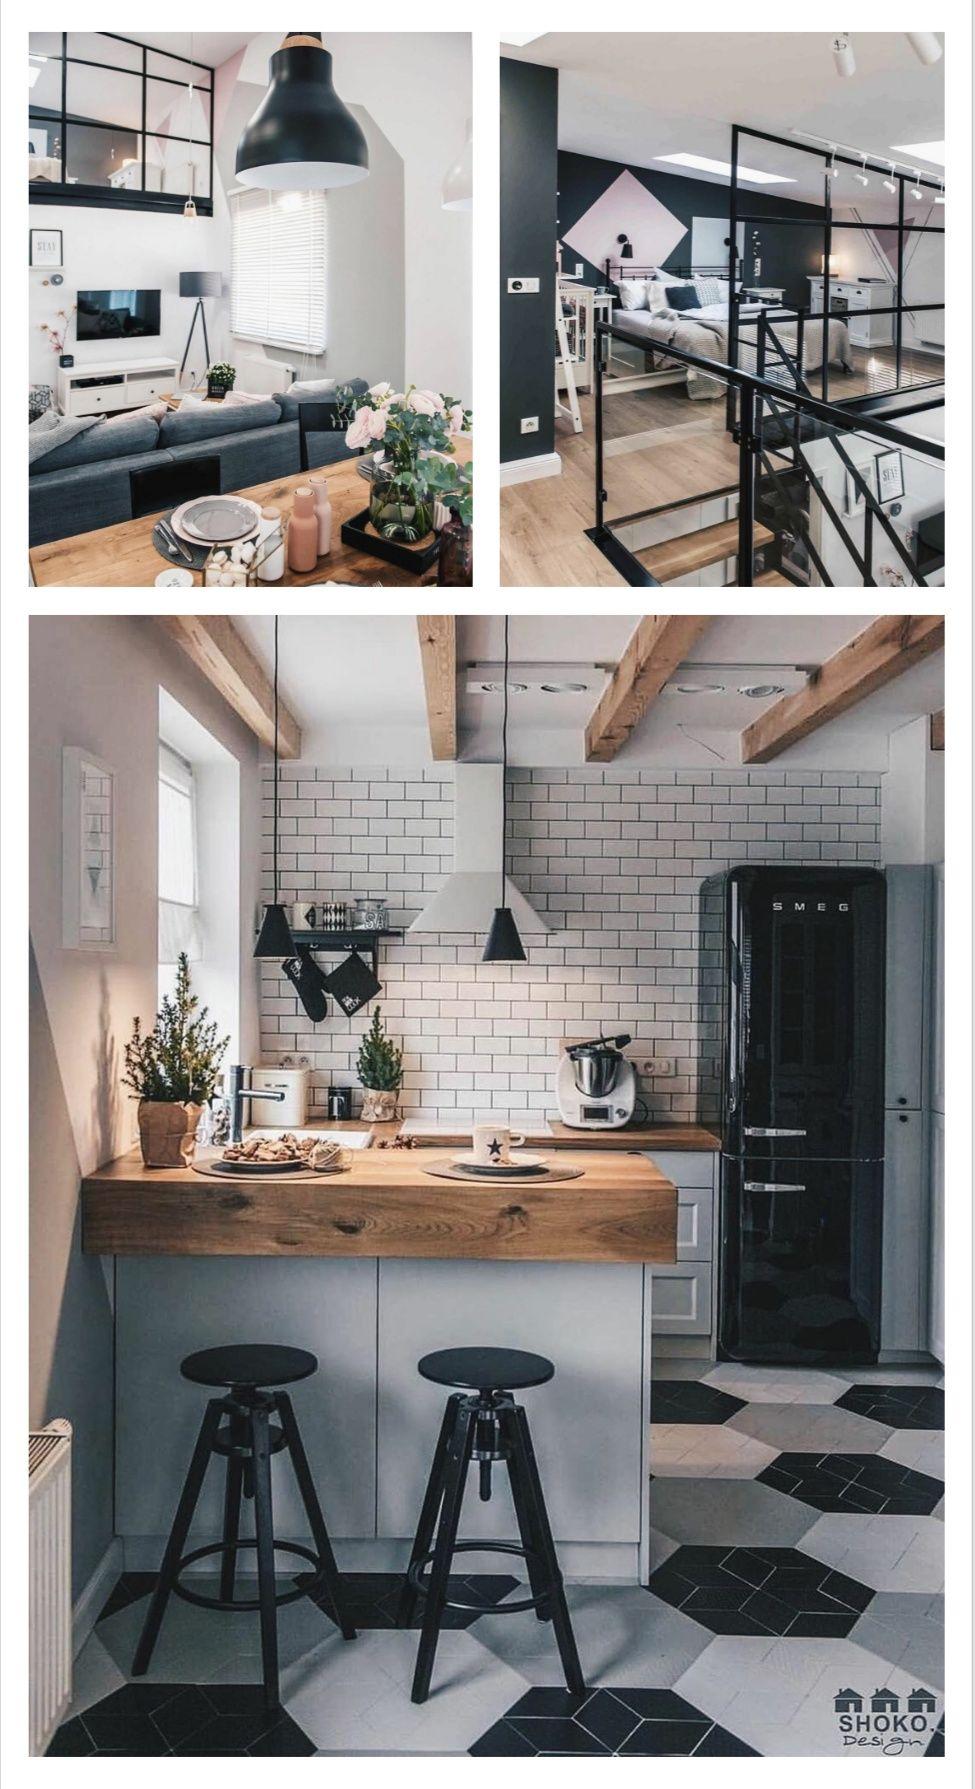 Duplex Inspiration // Shoko Design The Perfect ...